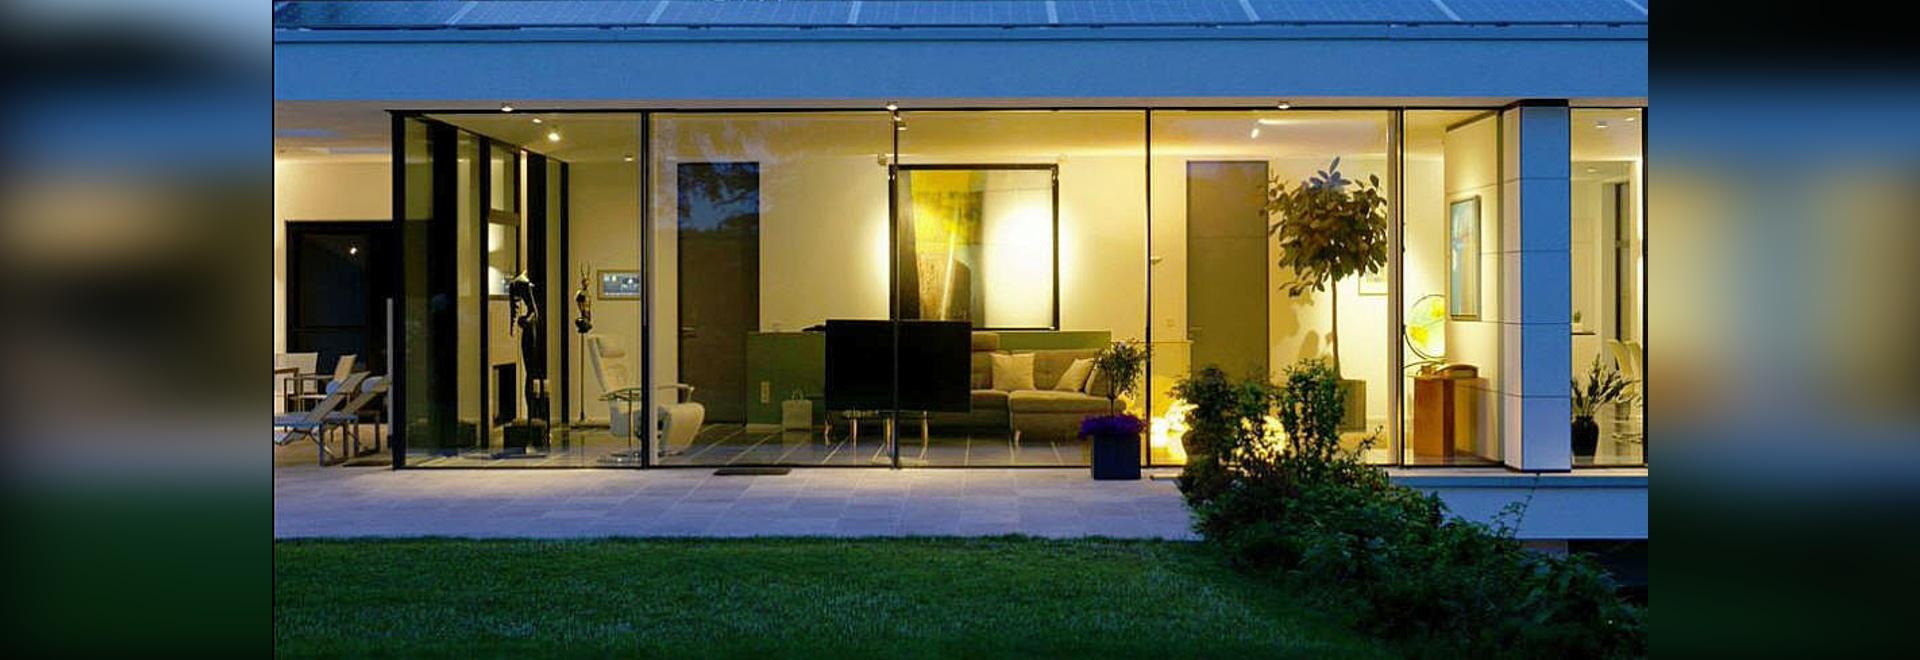 KELLER minimal windows® - architectural transparency